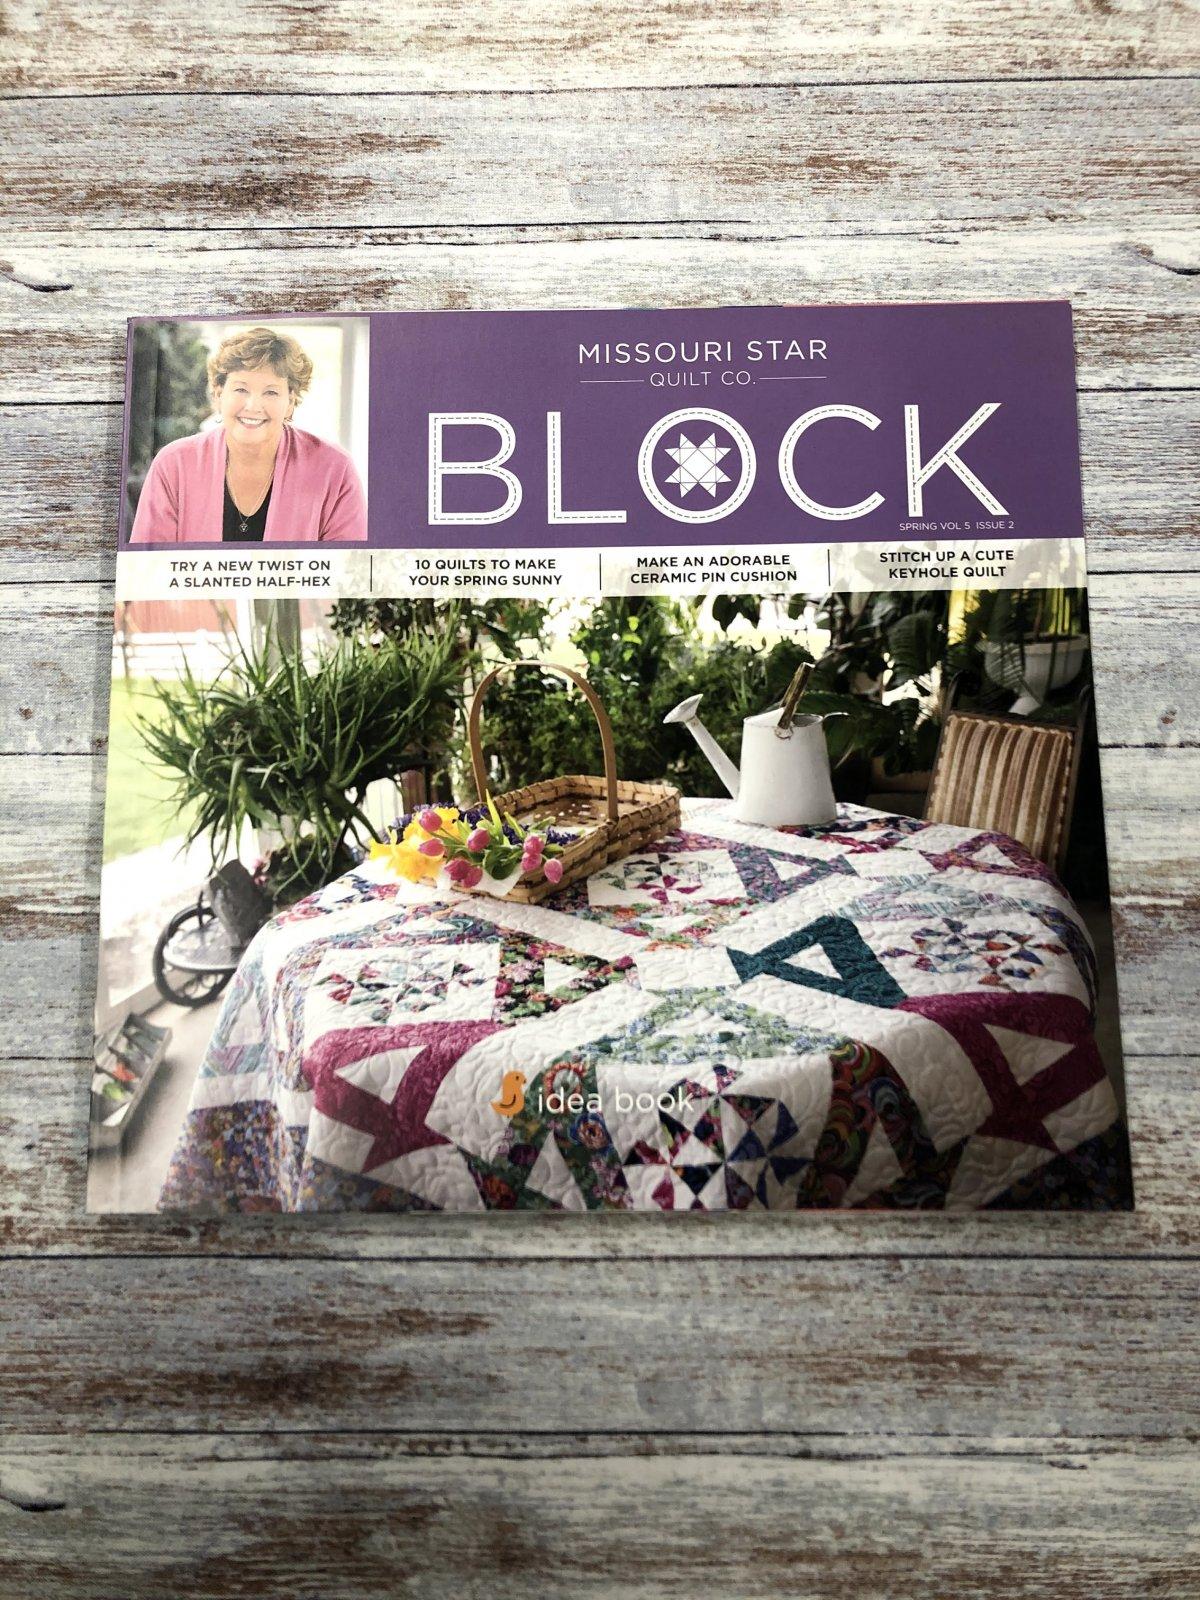 Missouri Star Block Spring 2018 Vol 5 Issue 2